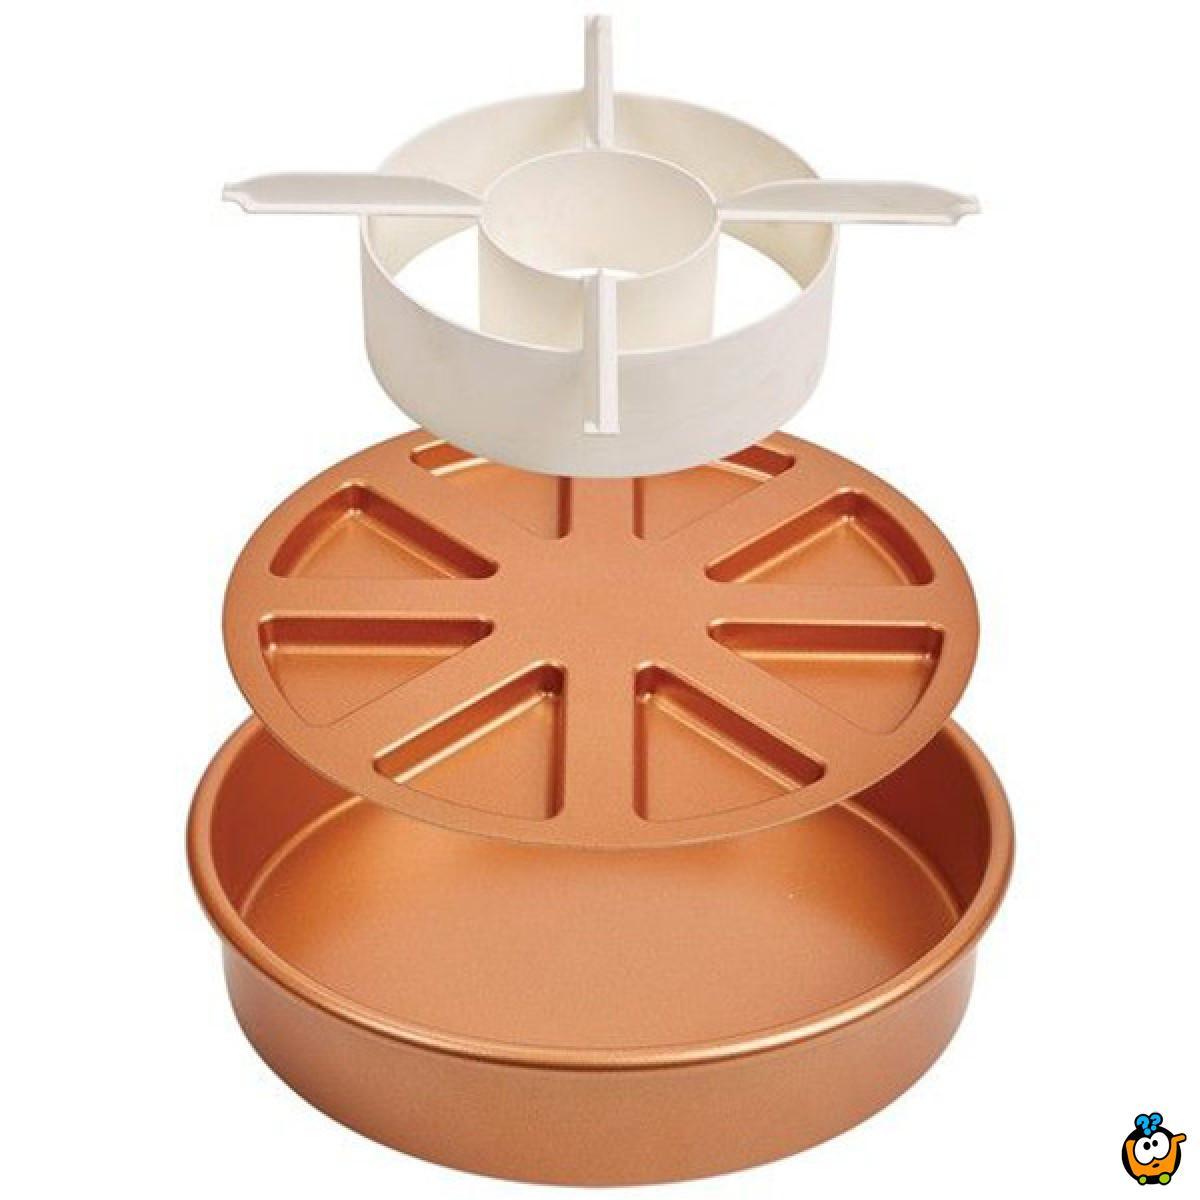 Copper Chef - trodelni set za pečenje, sečenje i kombinovanje patišpanja